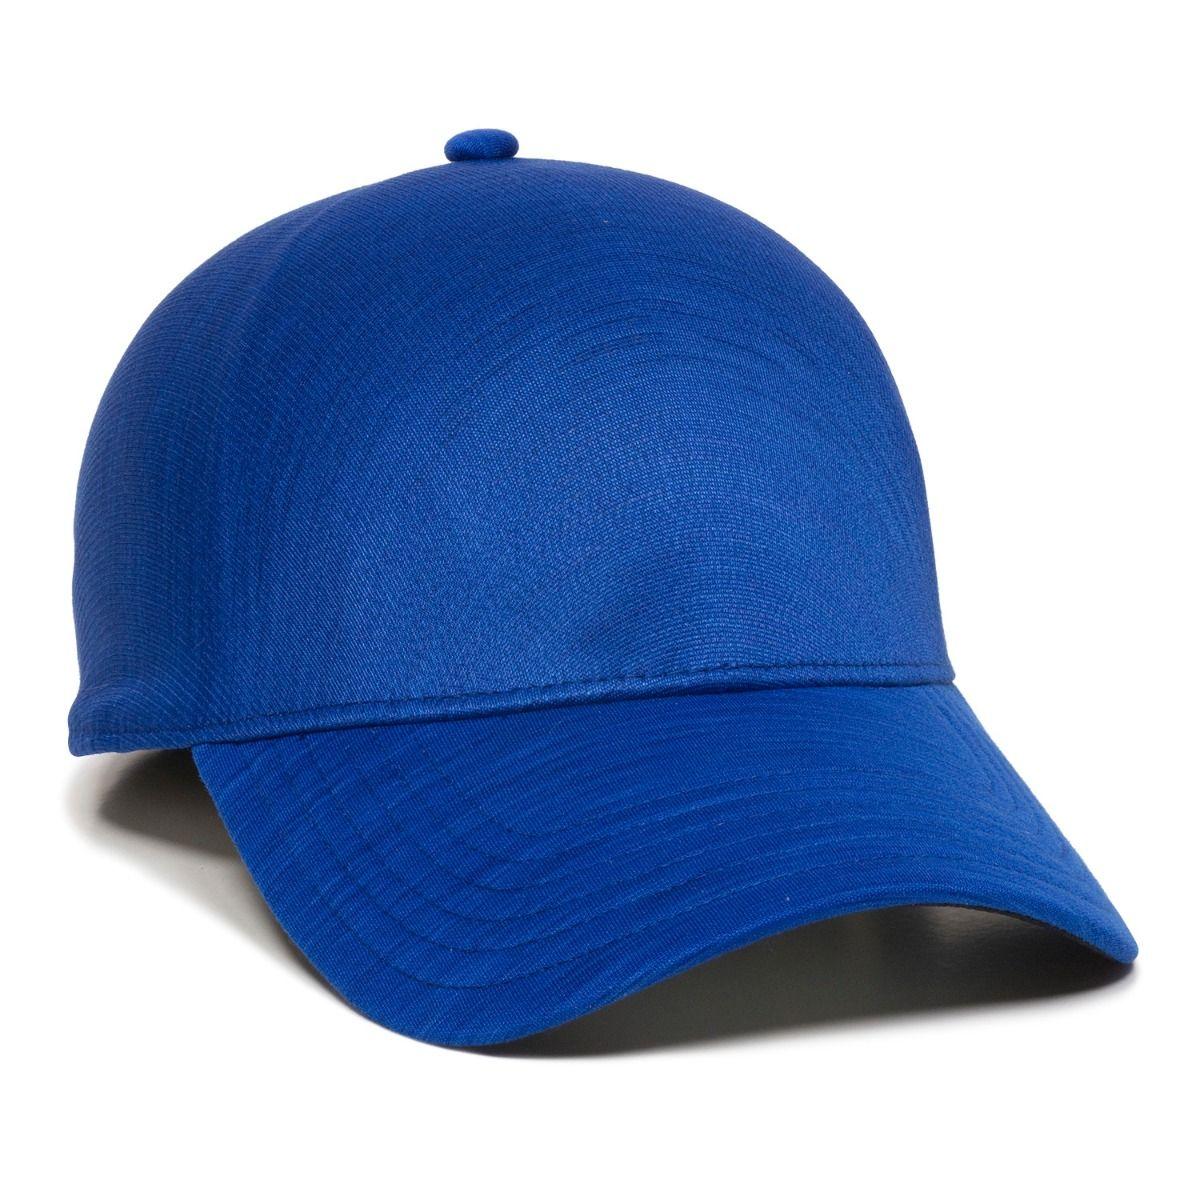 98aa36ded9ca56 SHIFT | Outdoor Cap - Team Headwear